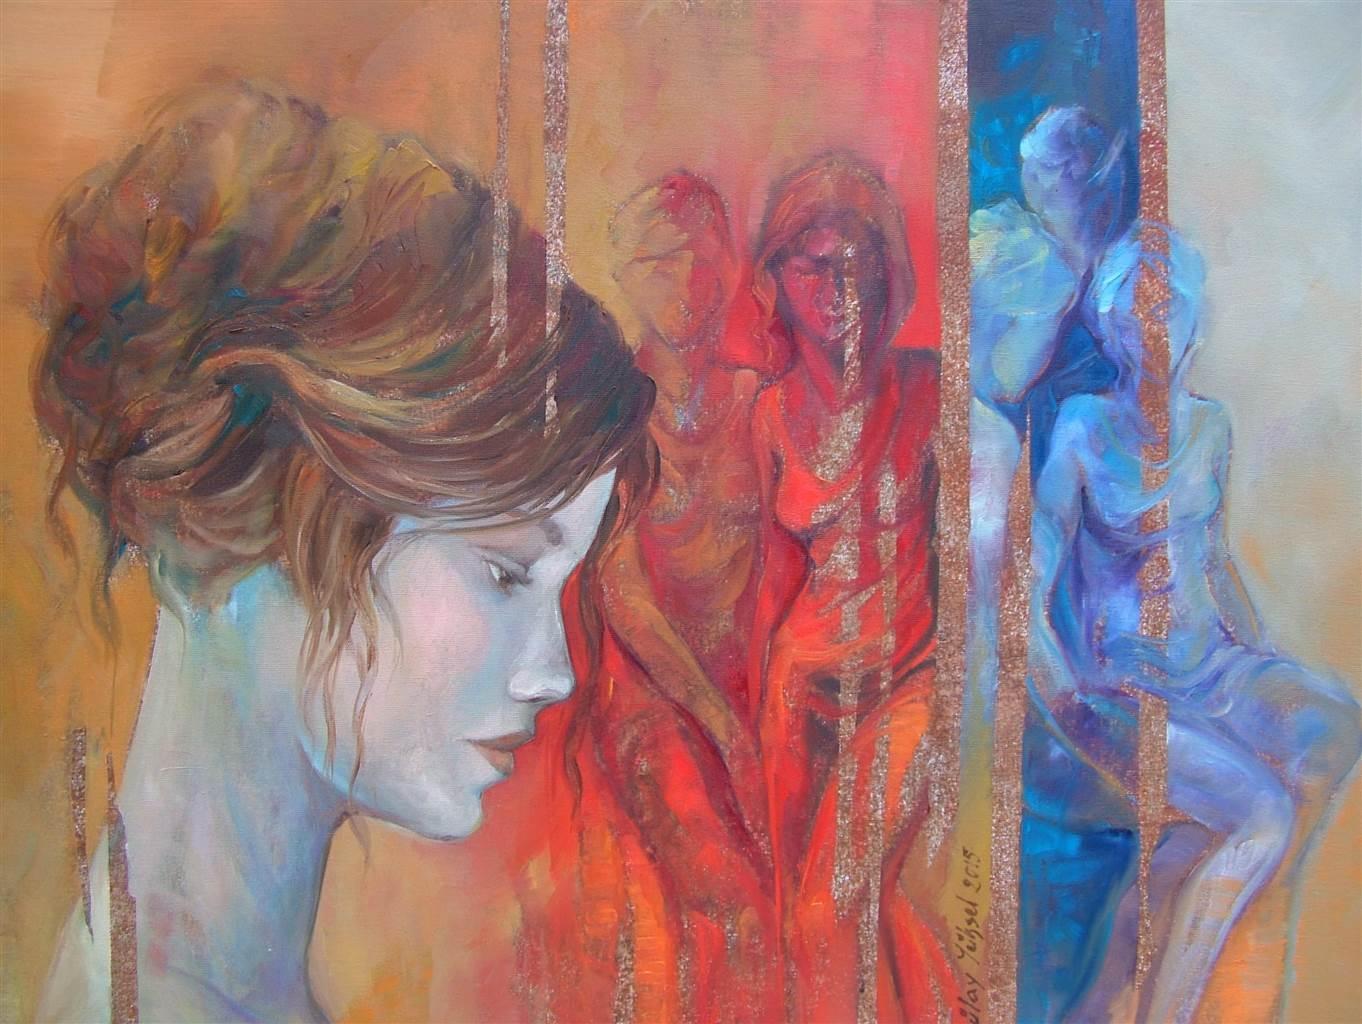 Gülay Yüksel, Jealousy, Oil on Canvas, 23.5x31.5 image